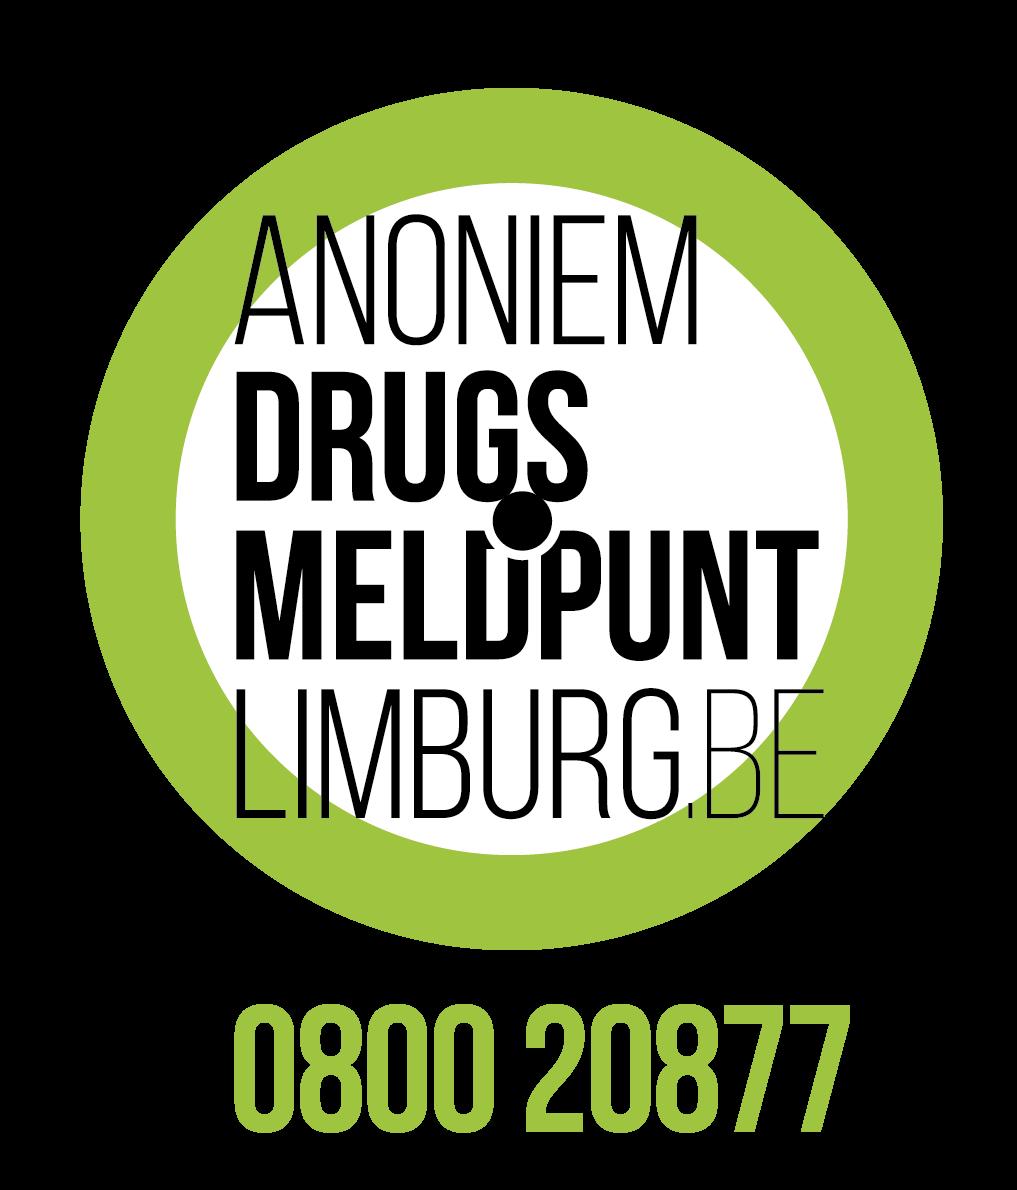 logo me tekst anoniem drugs meldpunt limburg